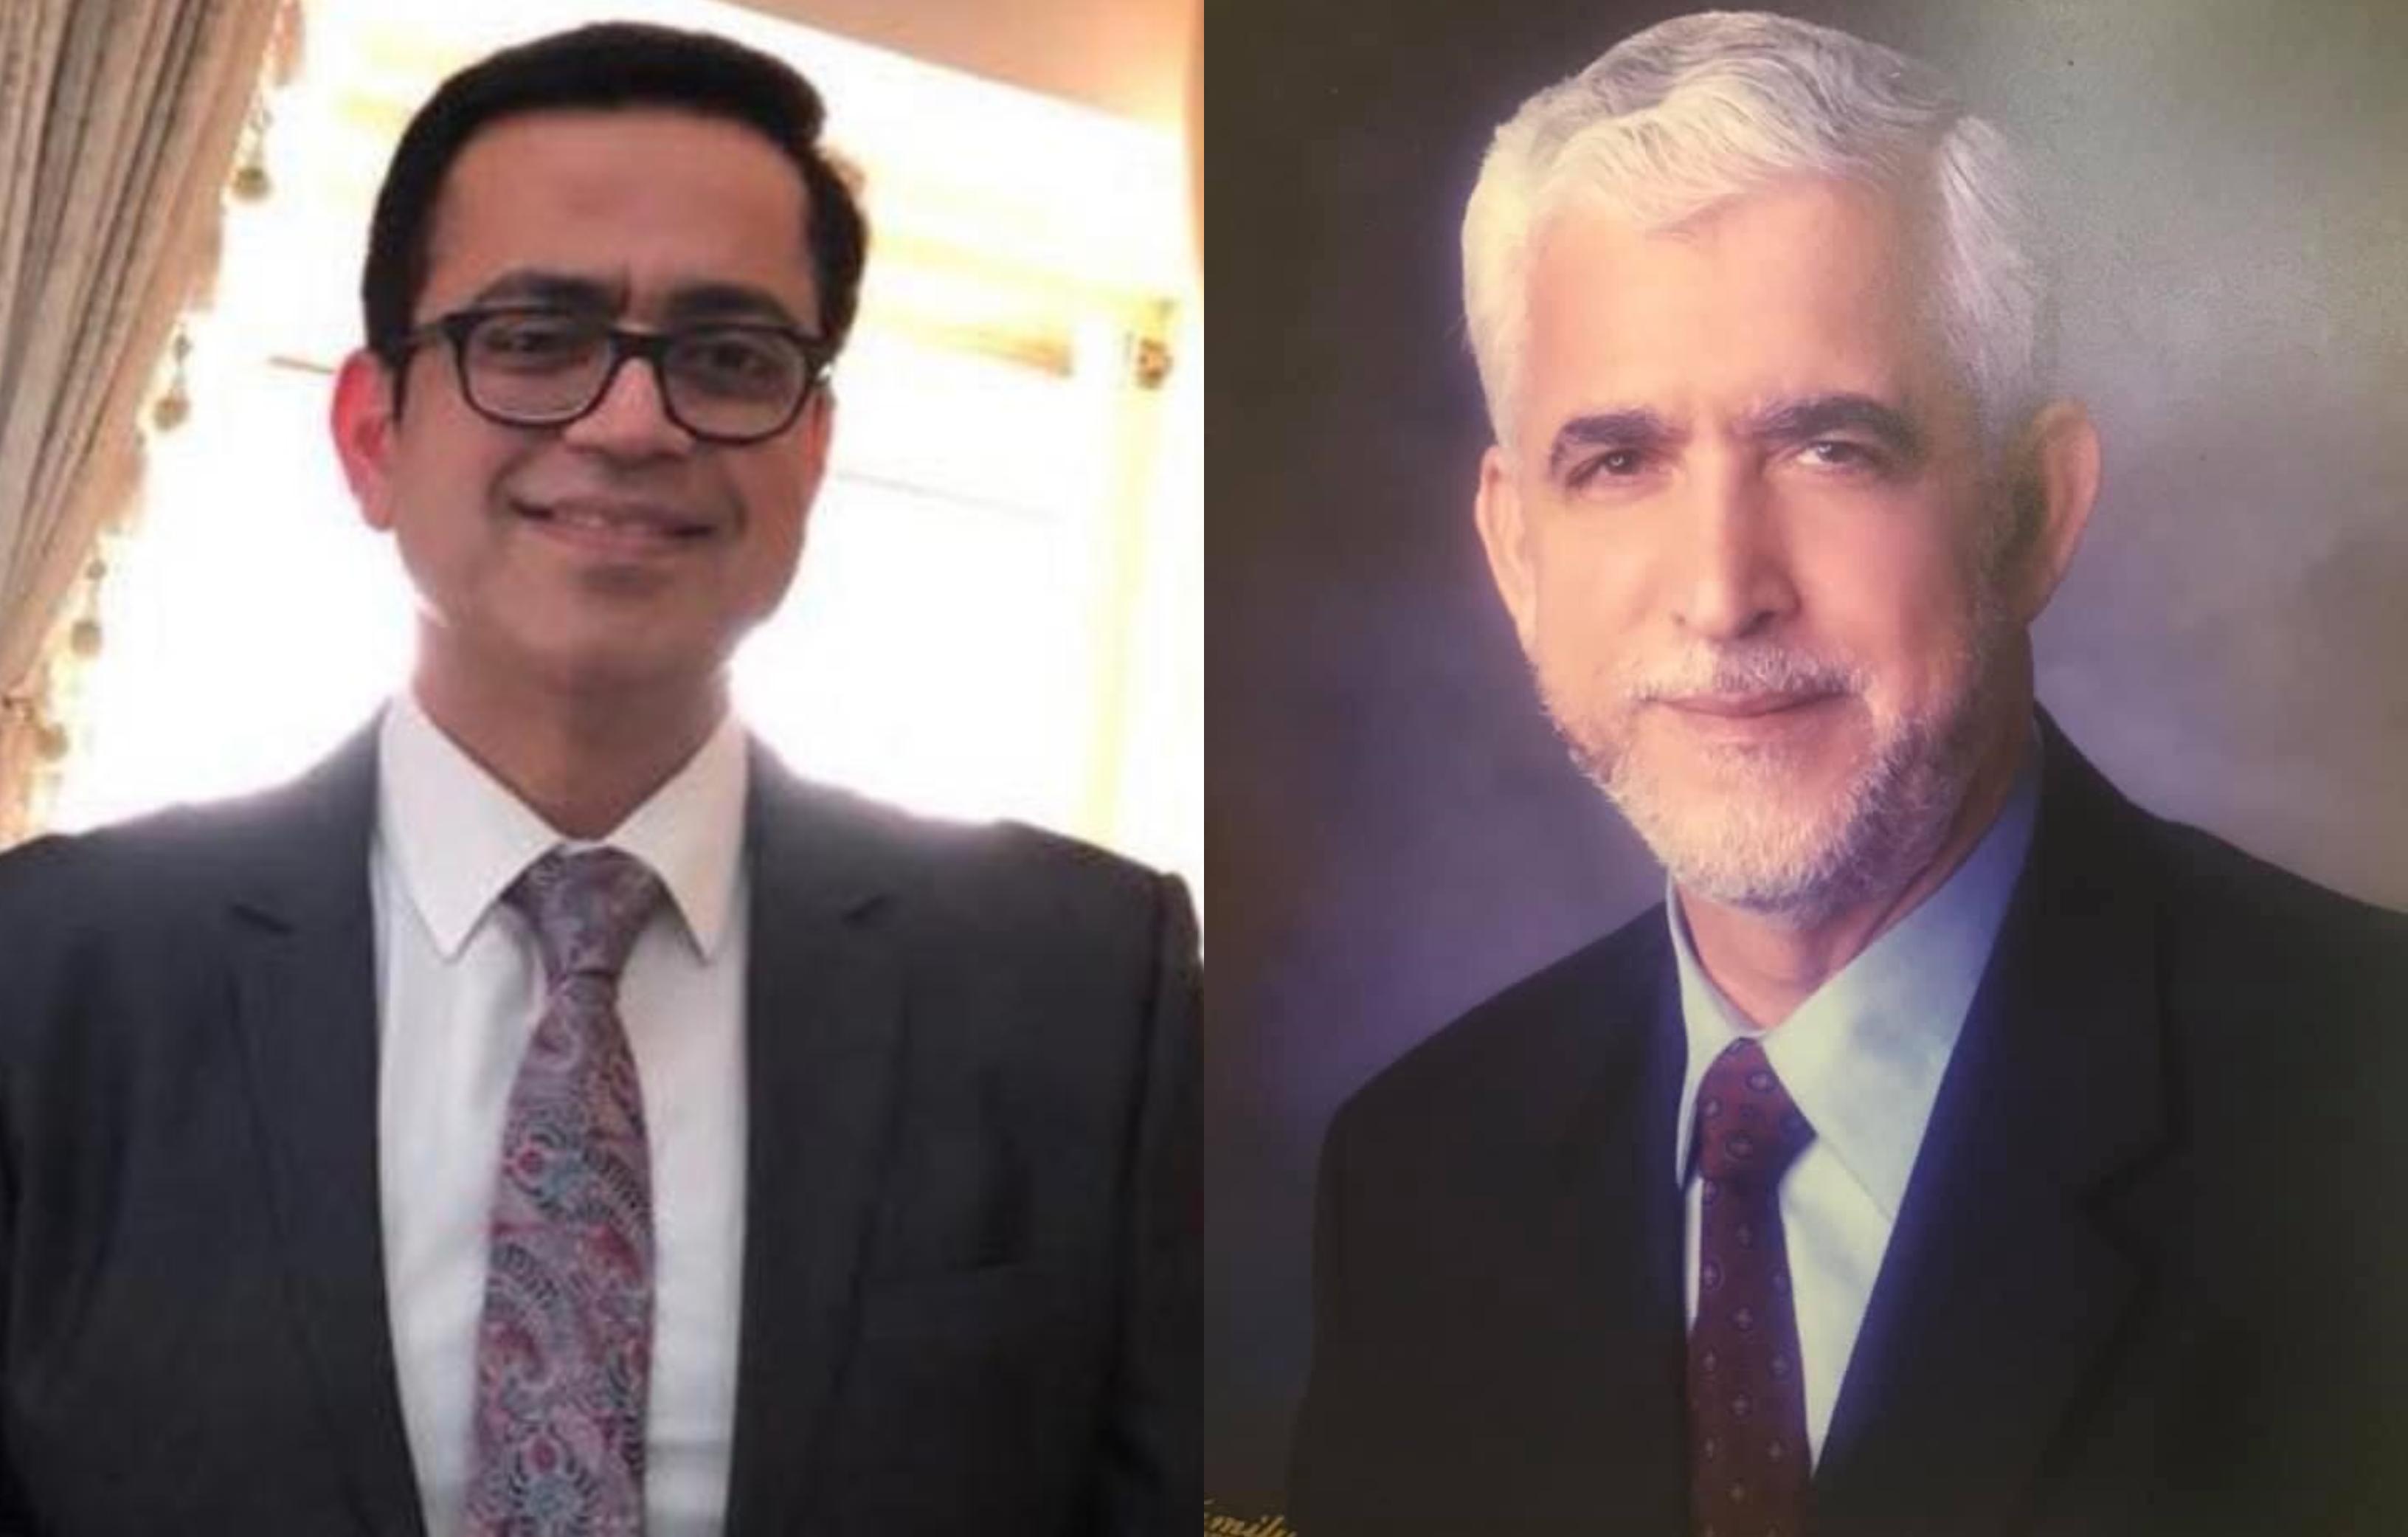 Hamas diplomat Mohammed al-Khudari (R) and his son, Hani, are imprisoned in Saudi Arabia (Twitter/@AmnestyGulf)